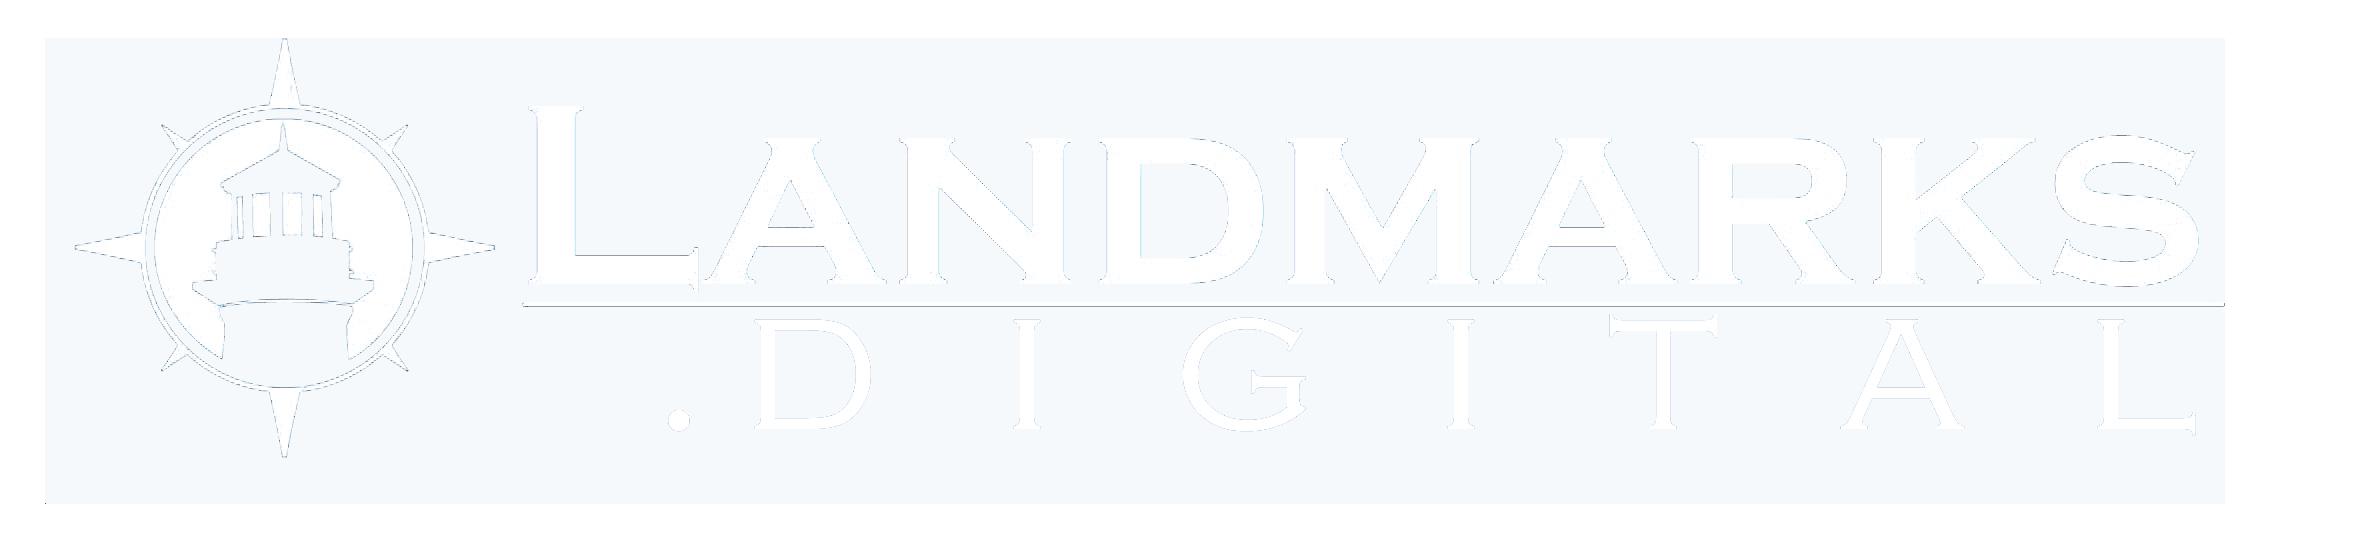 Landmarks Digital